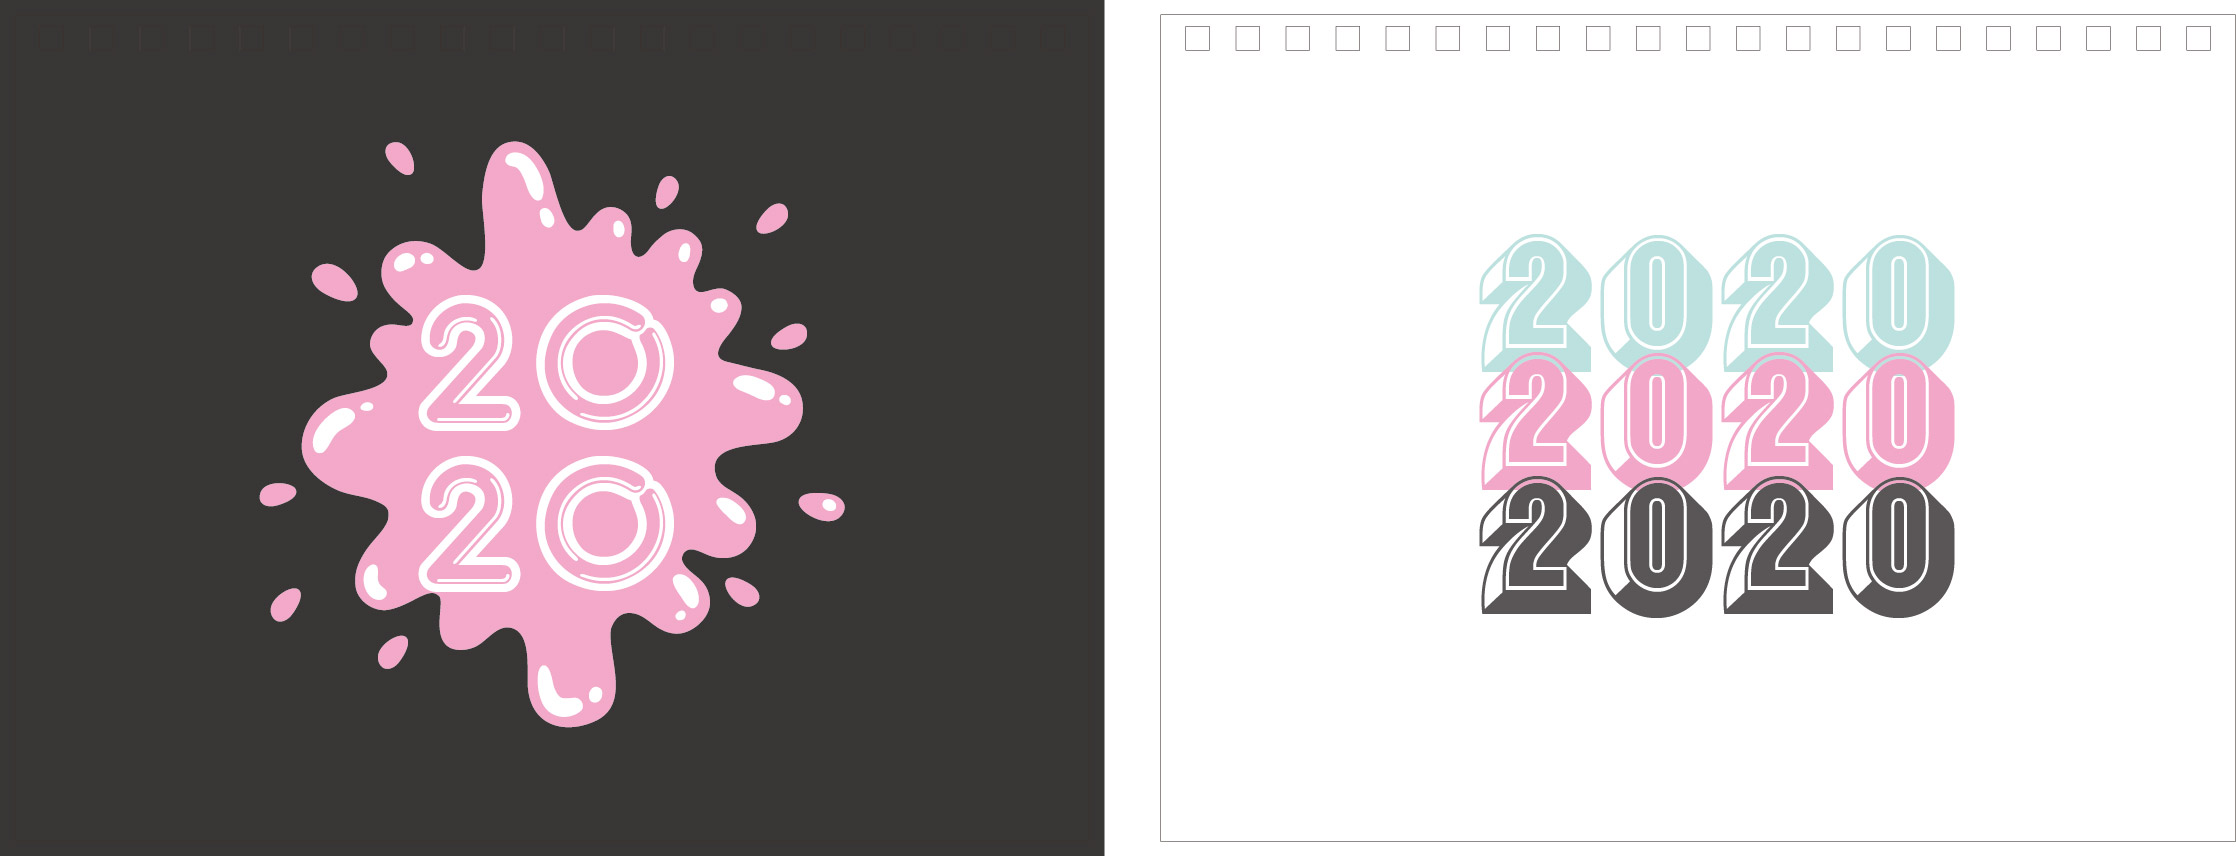 Print100 Desk CalendarB018